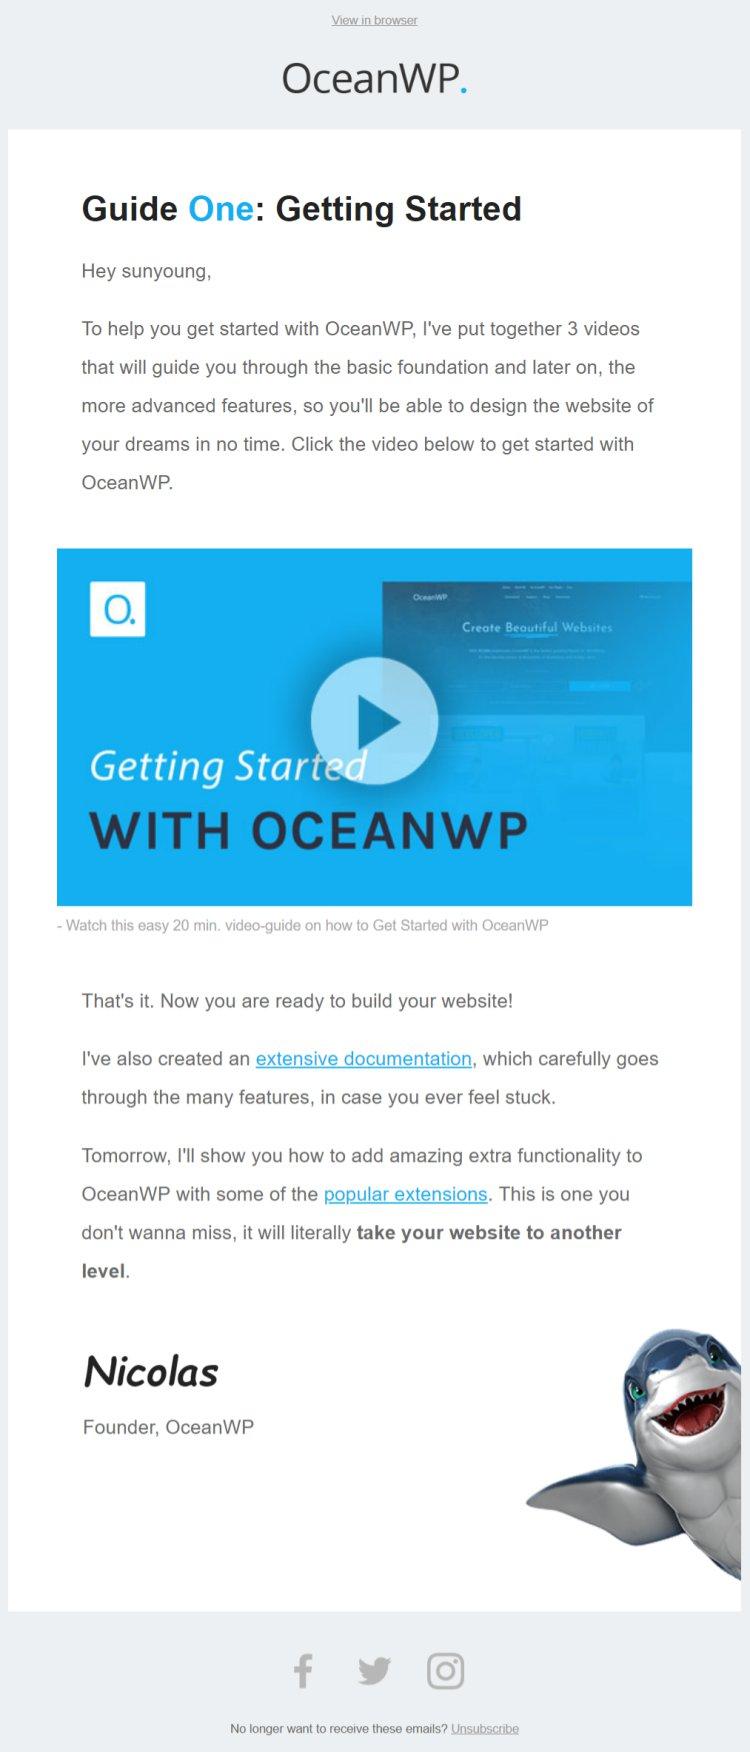 oceanWP 웰컴 시리즈 메일 첫번째